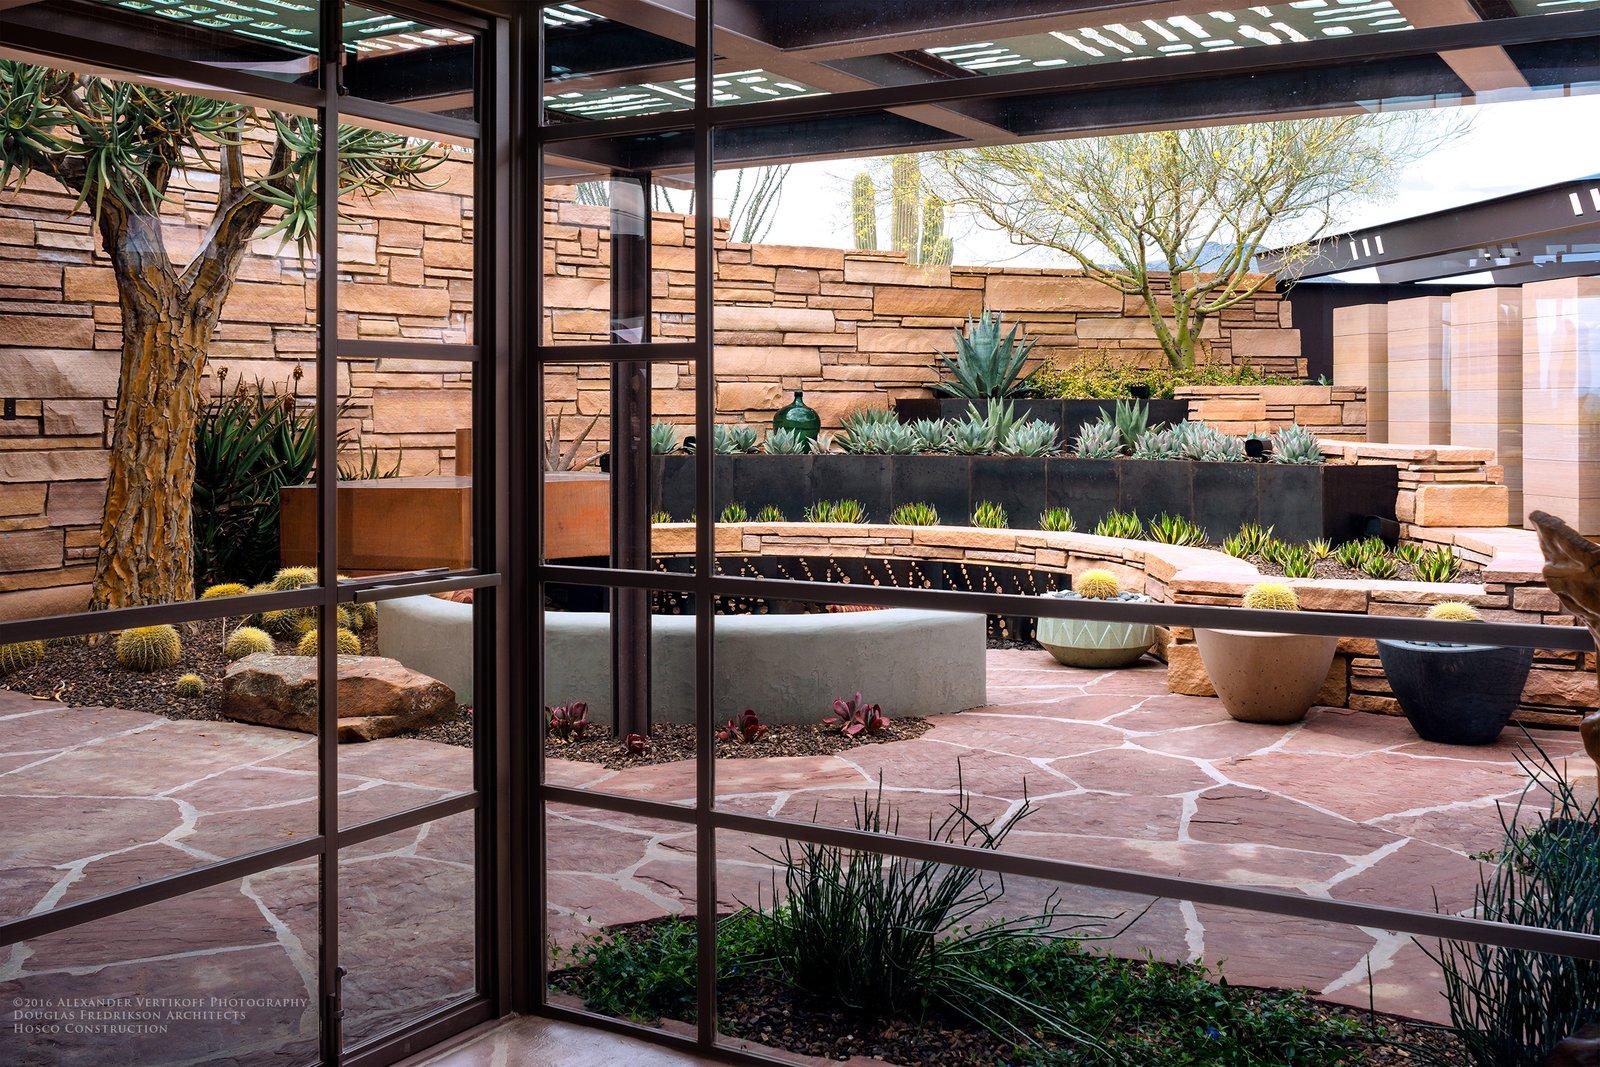 Kiva Courtyard  Saguaro Ridge/Orem Residence by Douglas Fredrikson